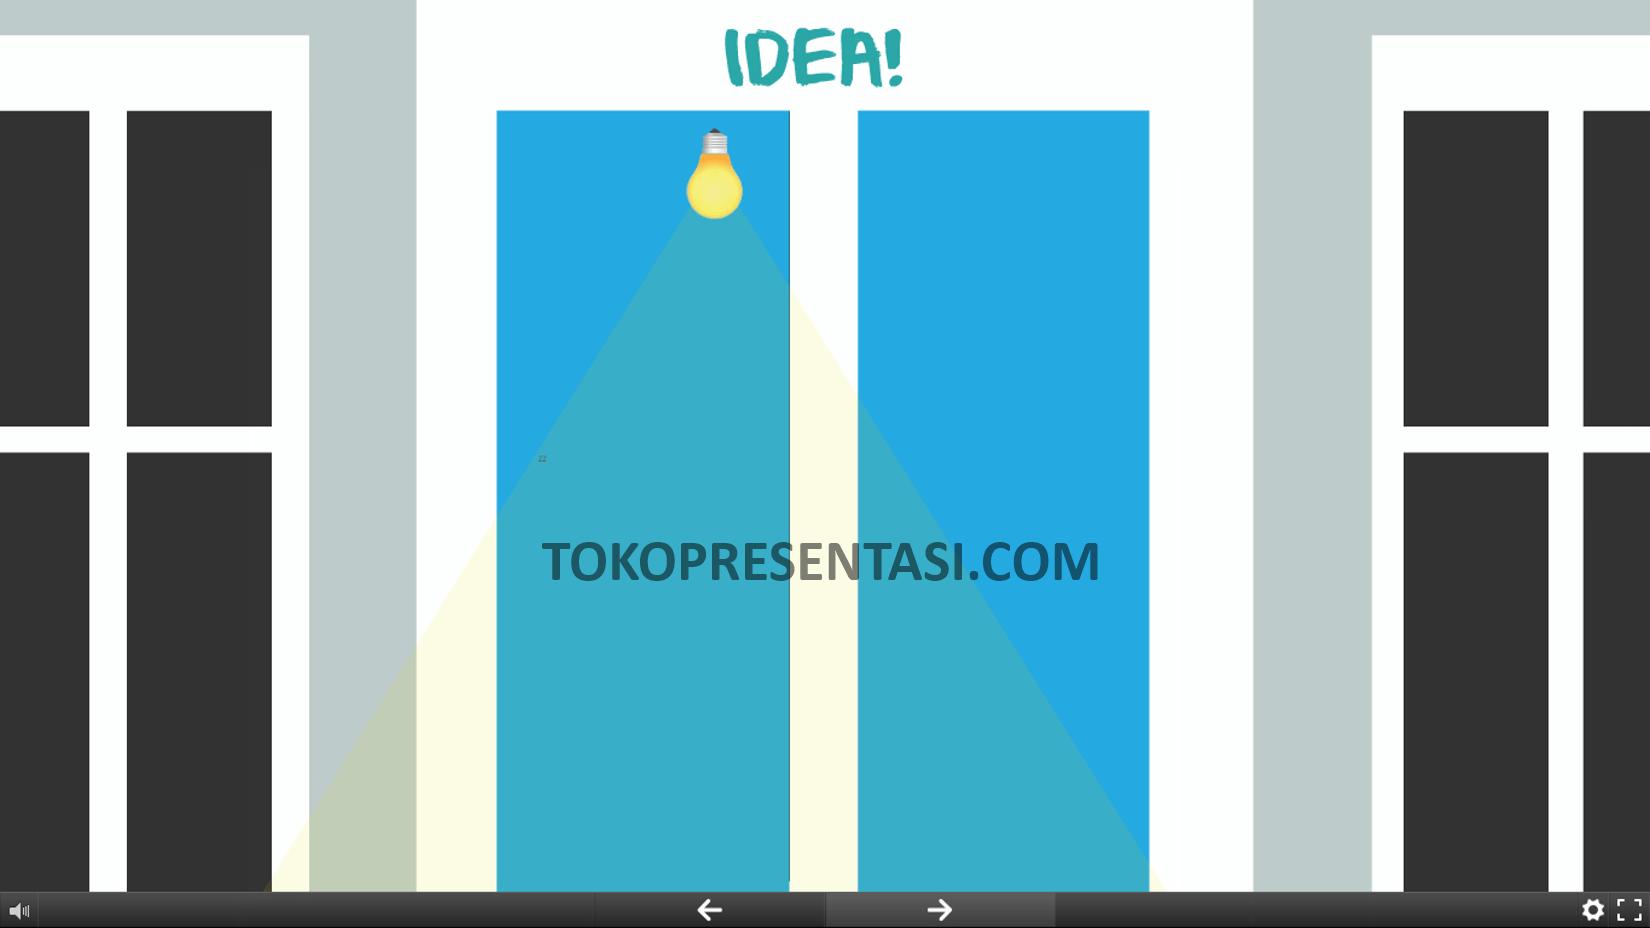 prezi - tokopresentasi.com